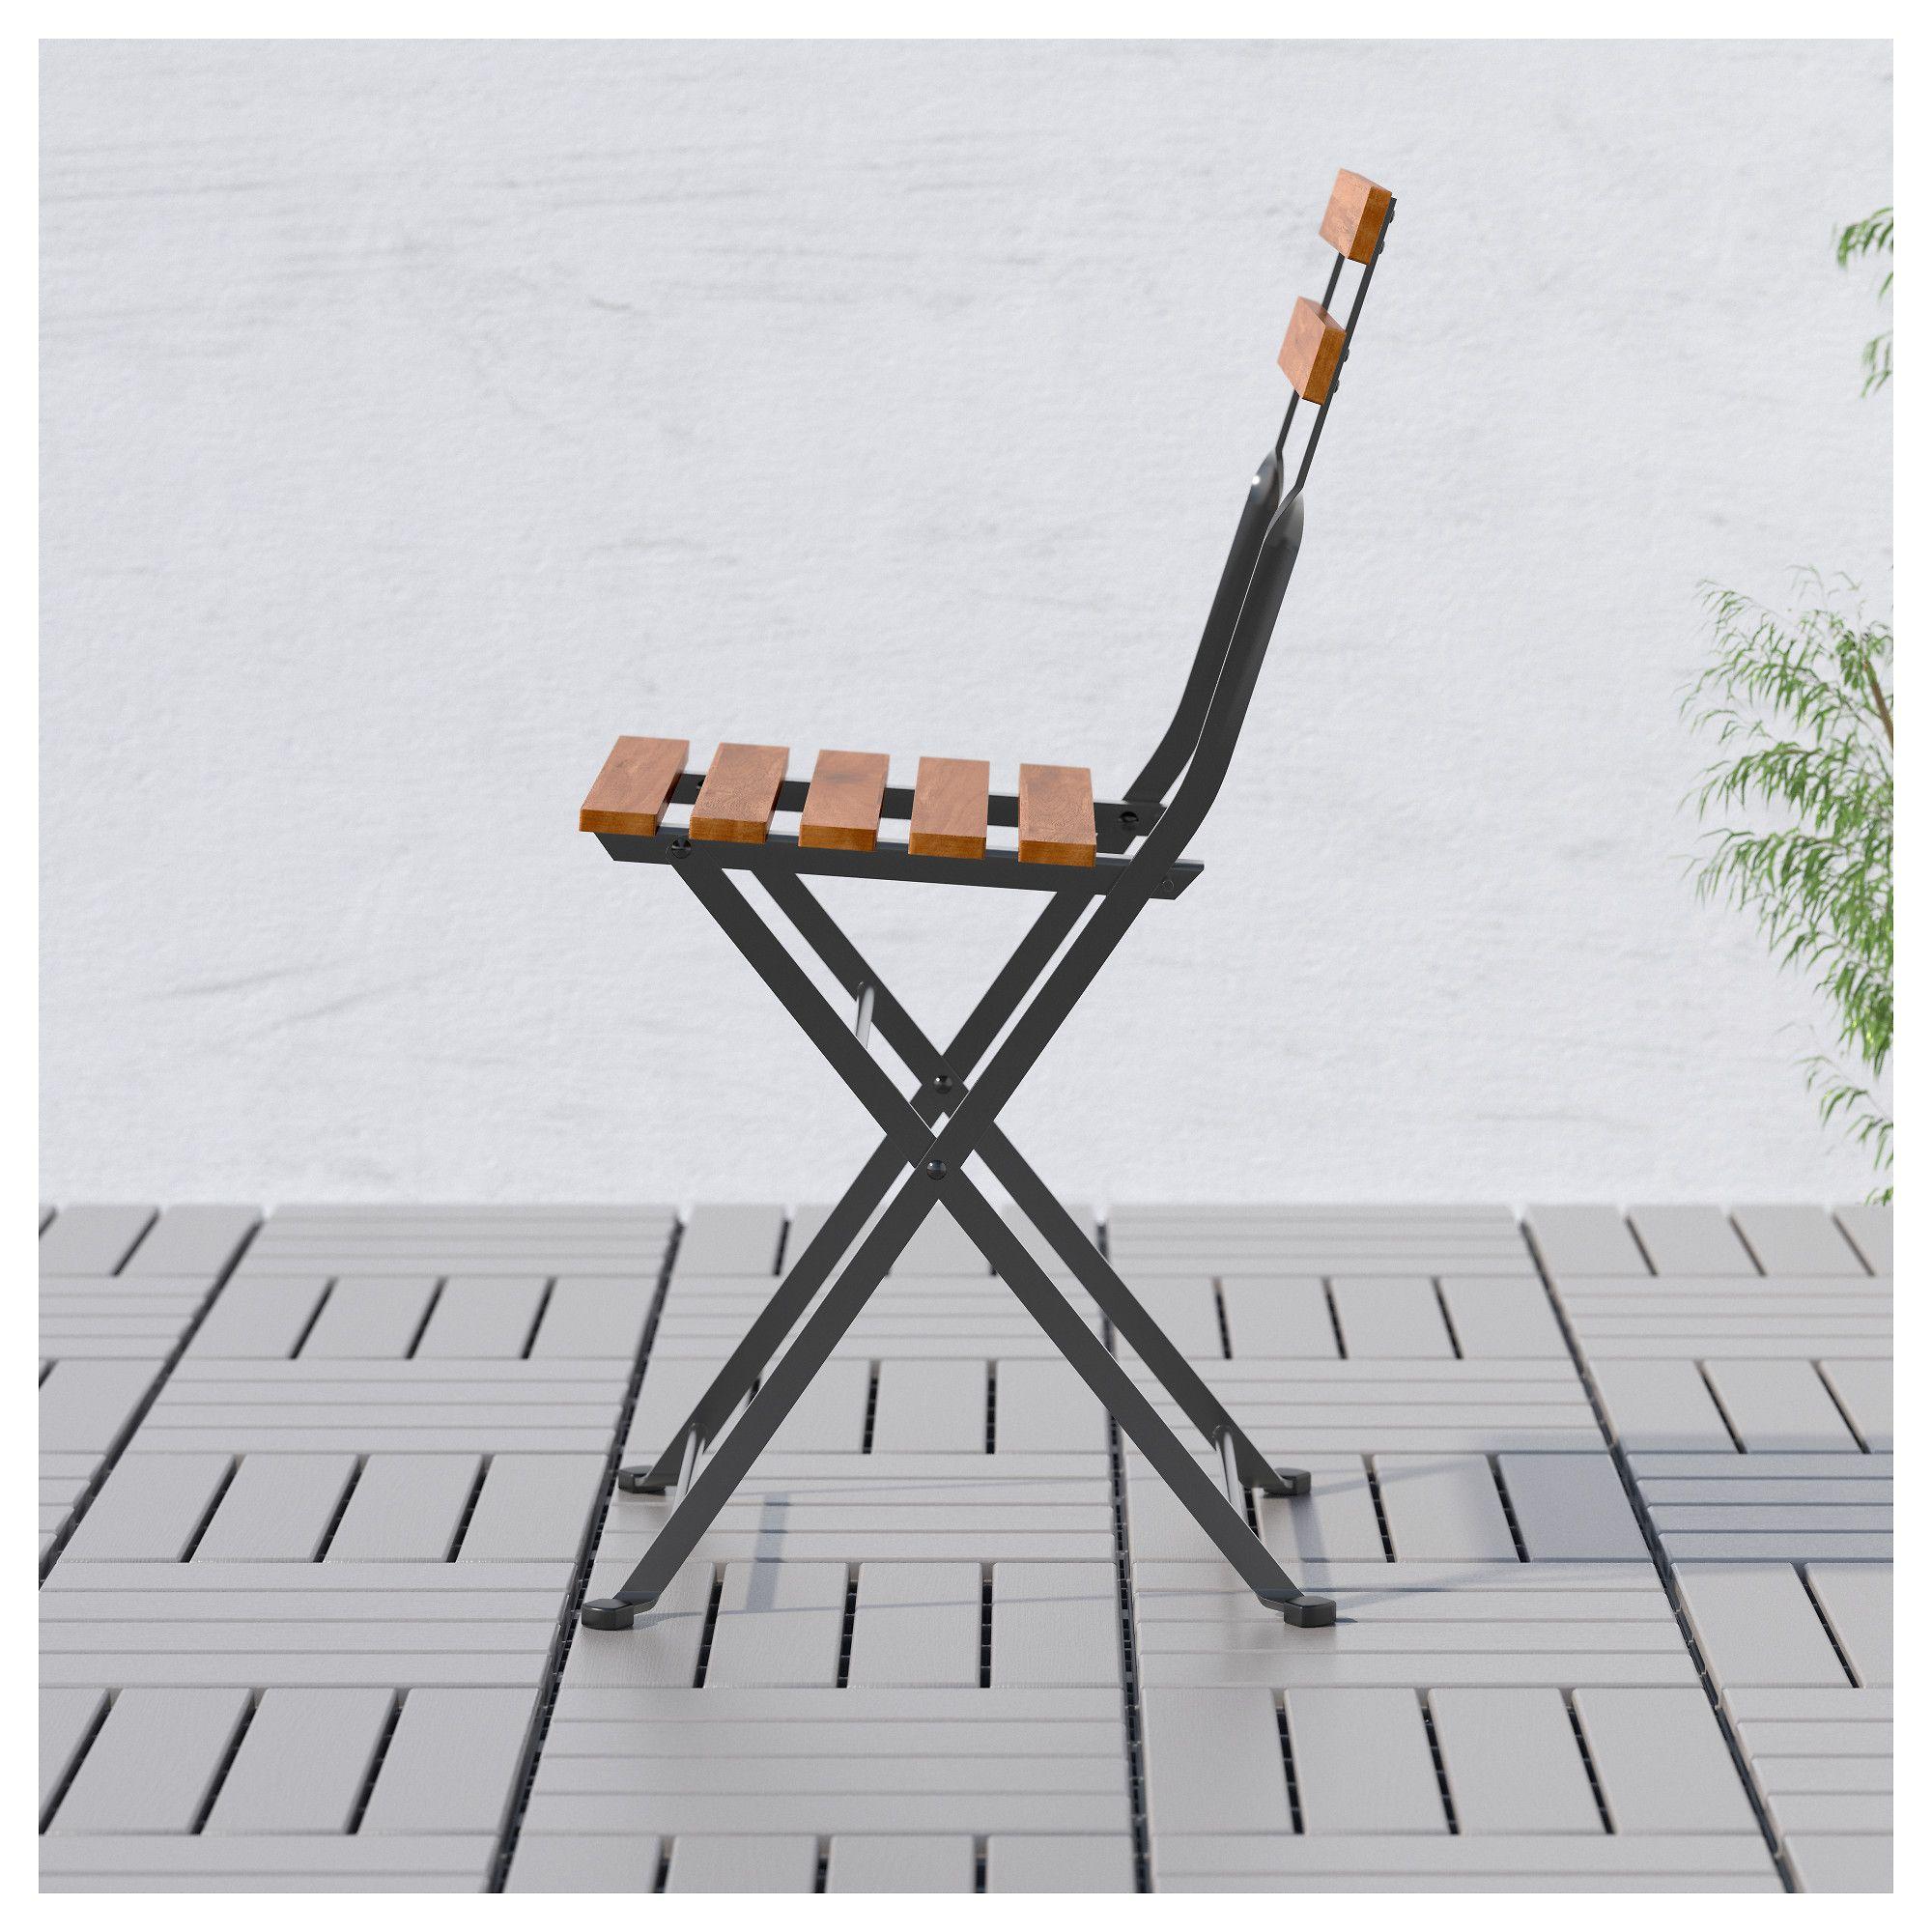 Tarno Chair Outdoor Foldable Acacia Black Gray Brown